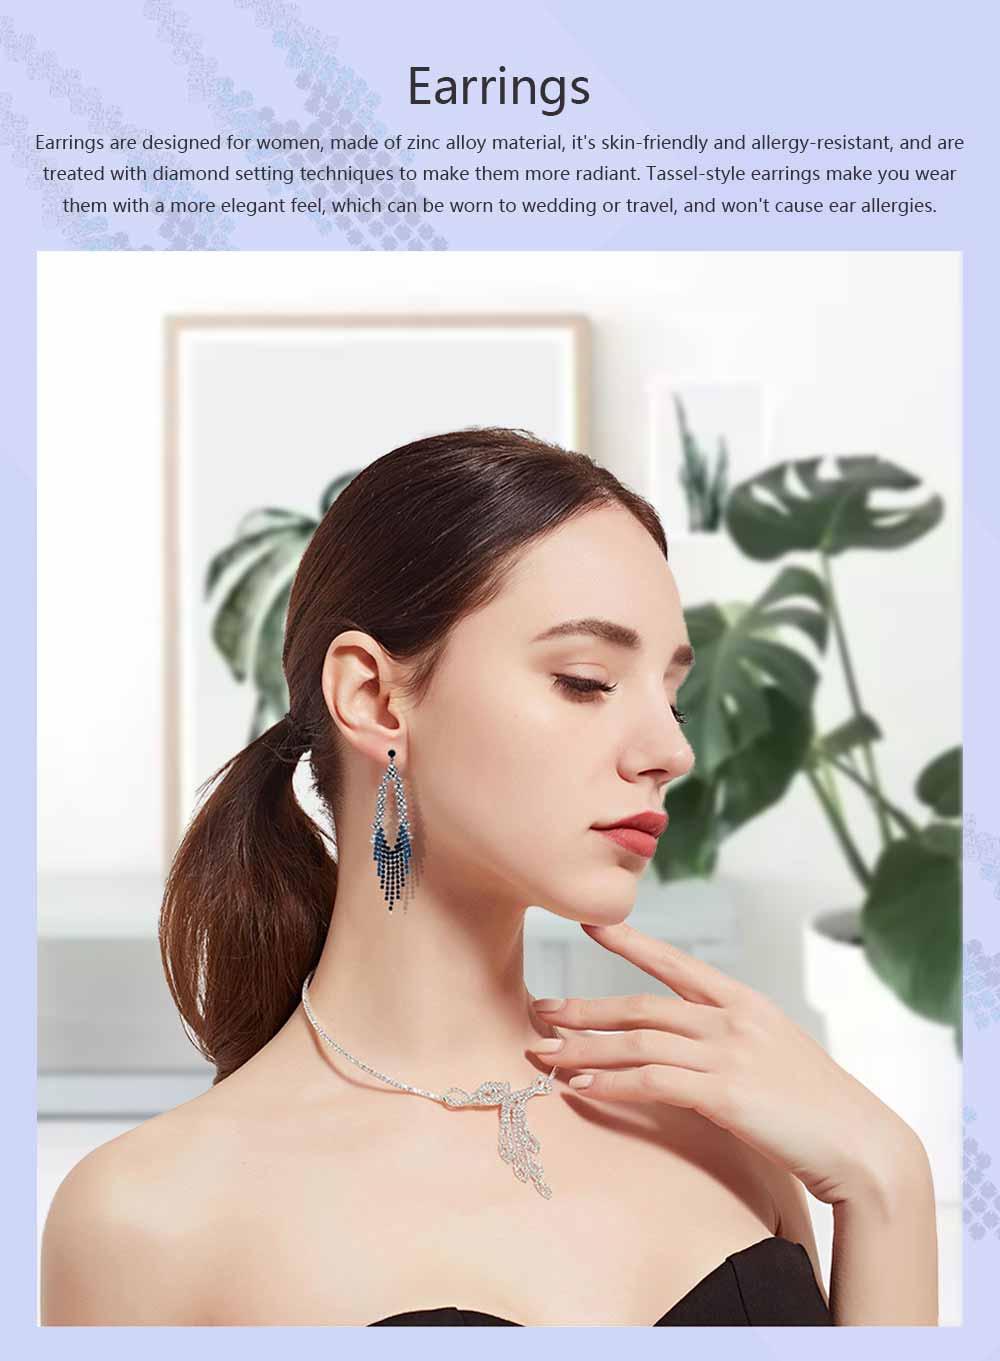 Women Tassel Earring Zinc Alloy Material Decoration Diamond Setting Process Jewelry Allergy-resistant Ear Pendant 0